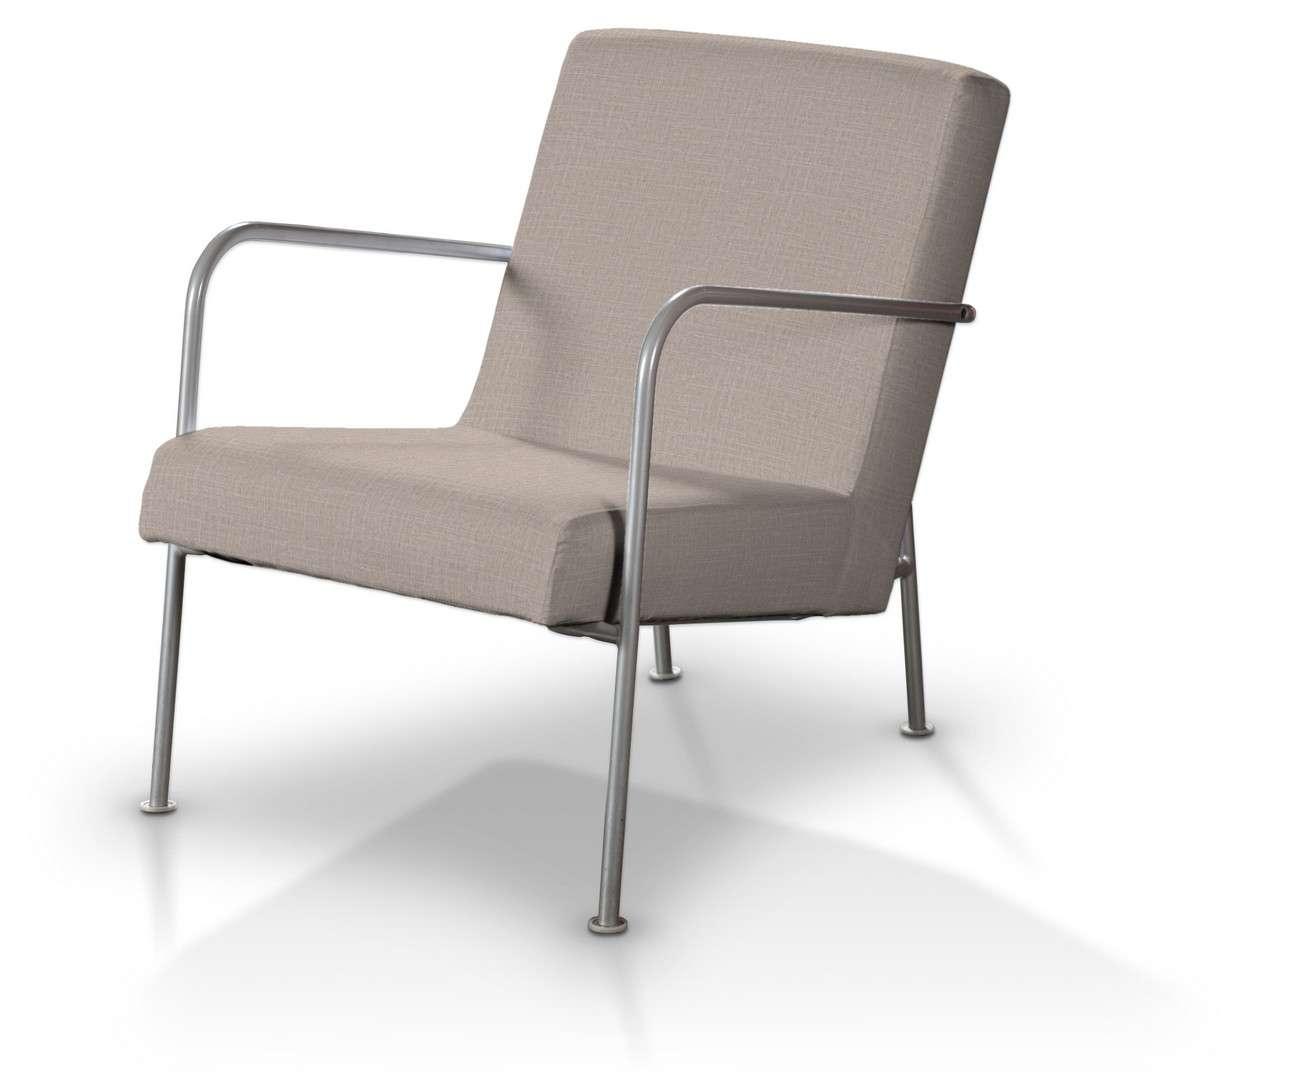 Pokrowiec na fotel Ikea PS w kolekcji Living II, tkanina: 160-85